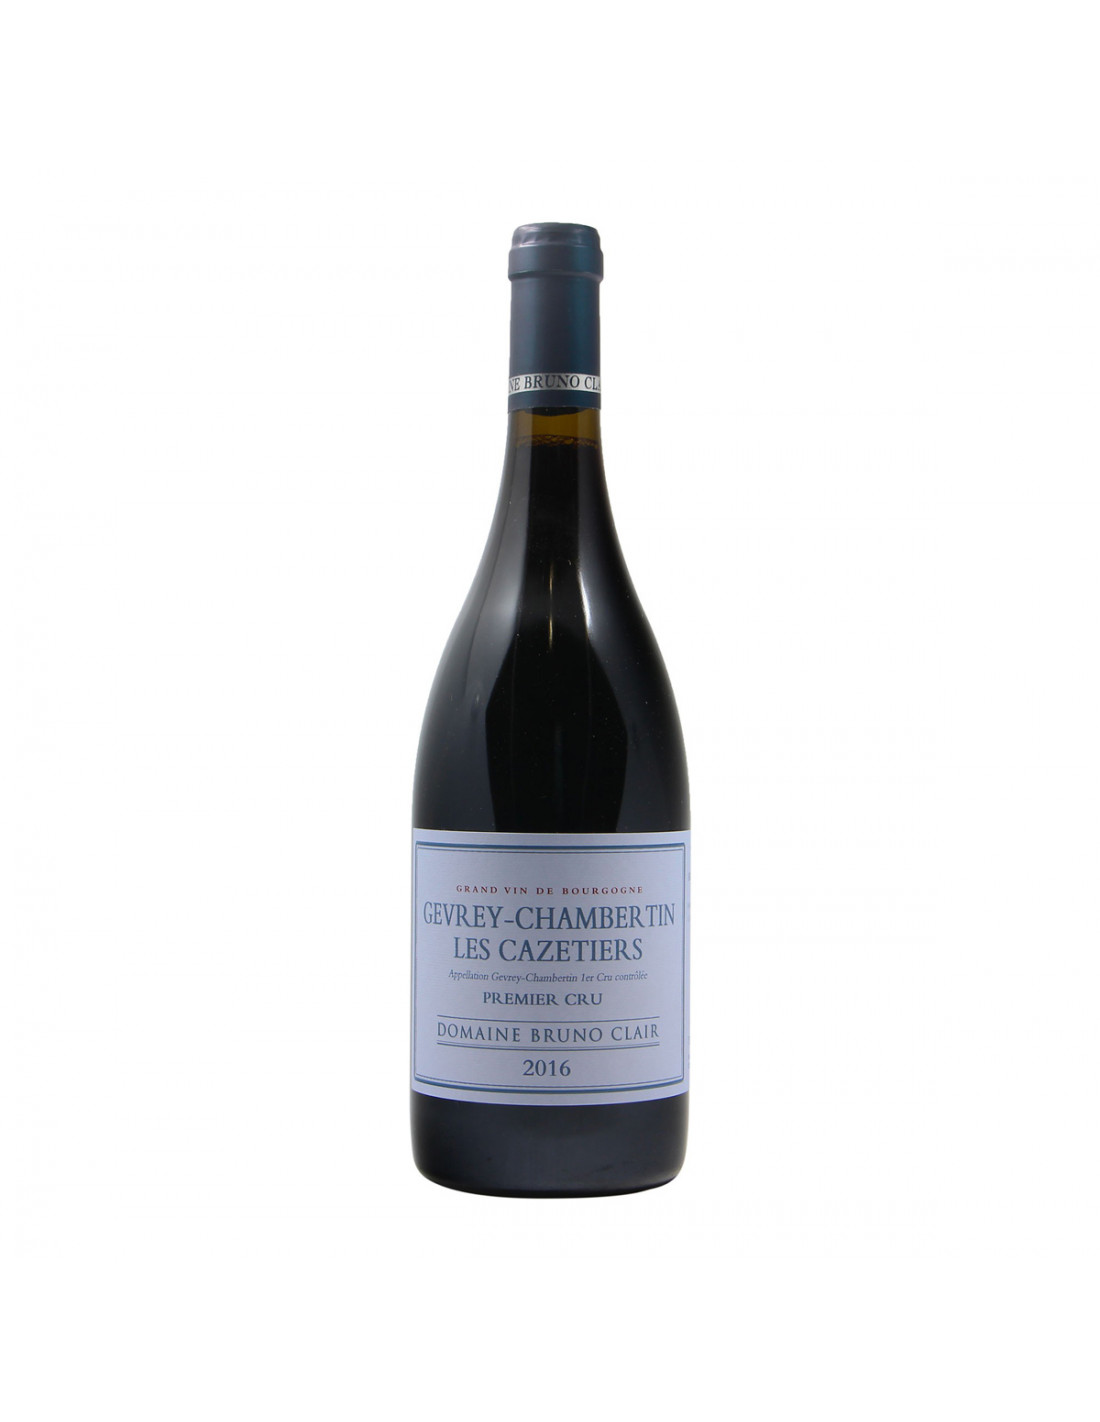 Domaine Bruno Clair Gevrey Chambertin 1er Cru Les Cazetieres 2016 Grandi Bottiglie